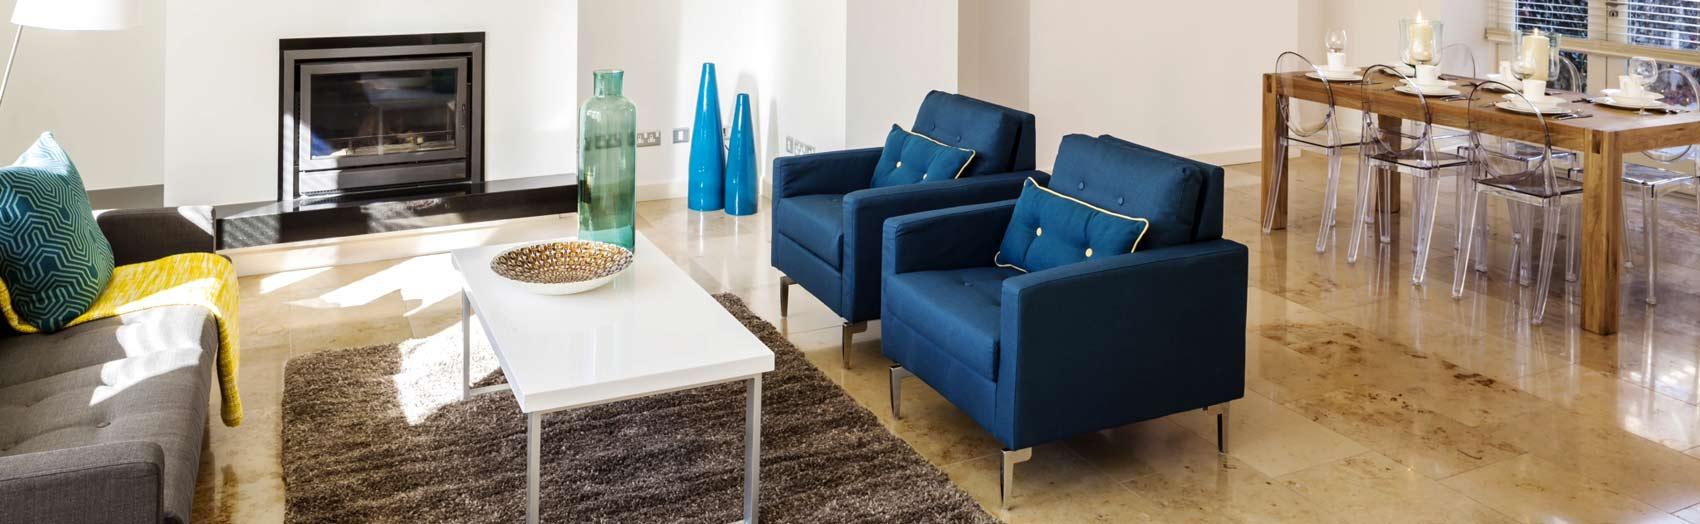 Furniture Sales